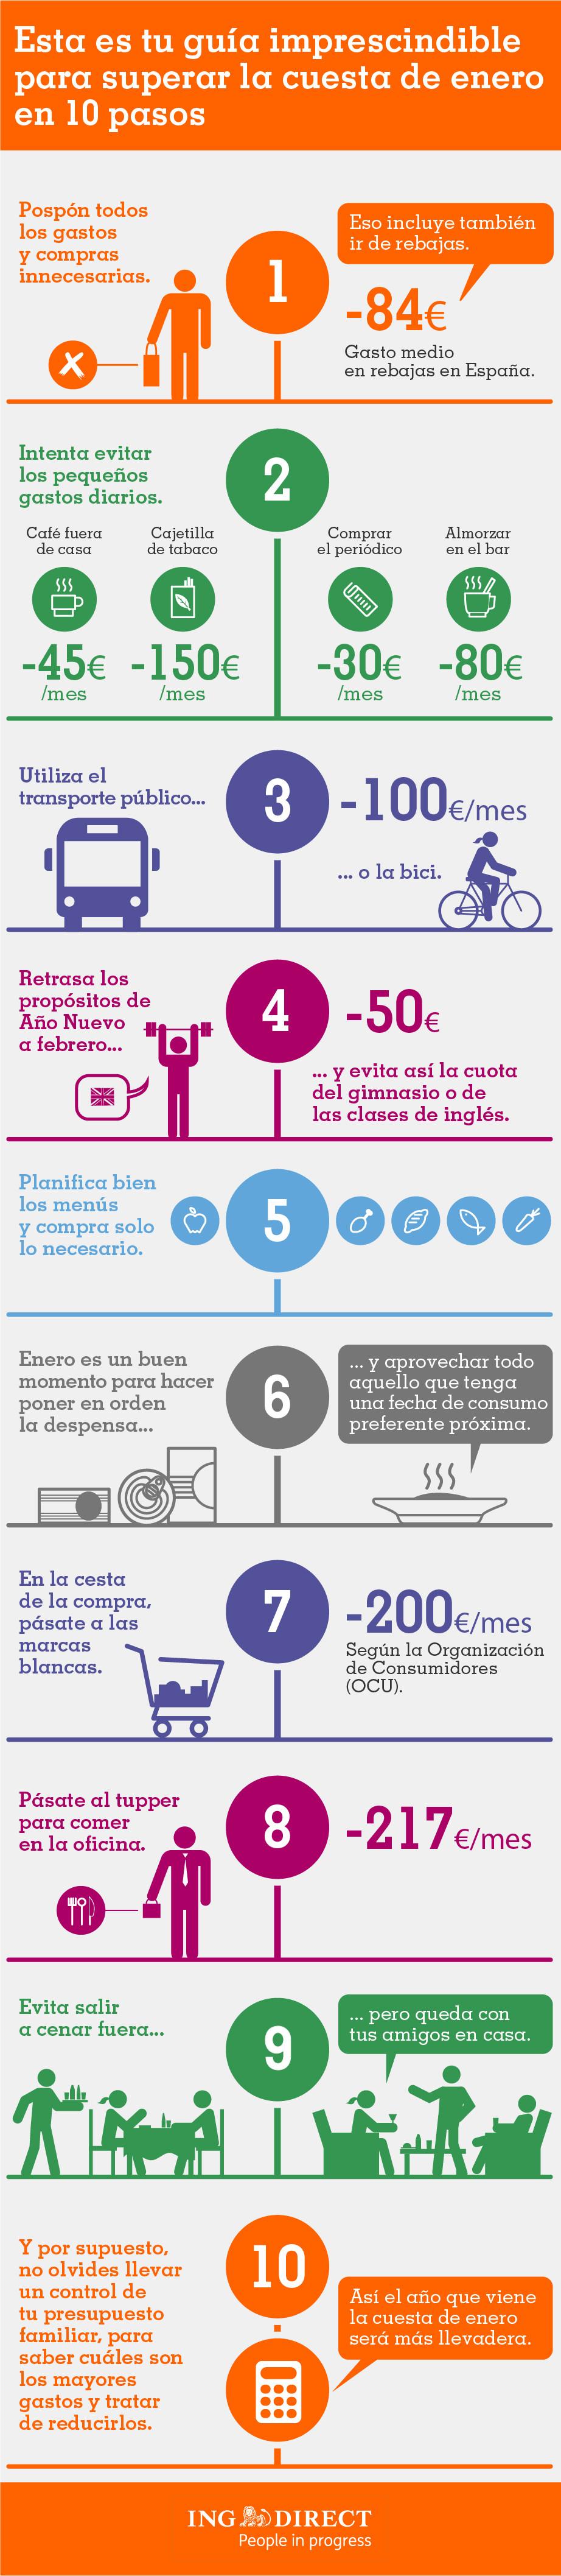 Cuesta-enero-infografia